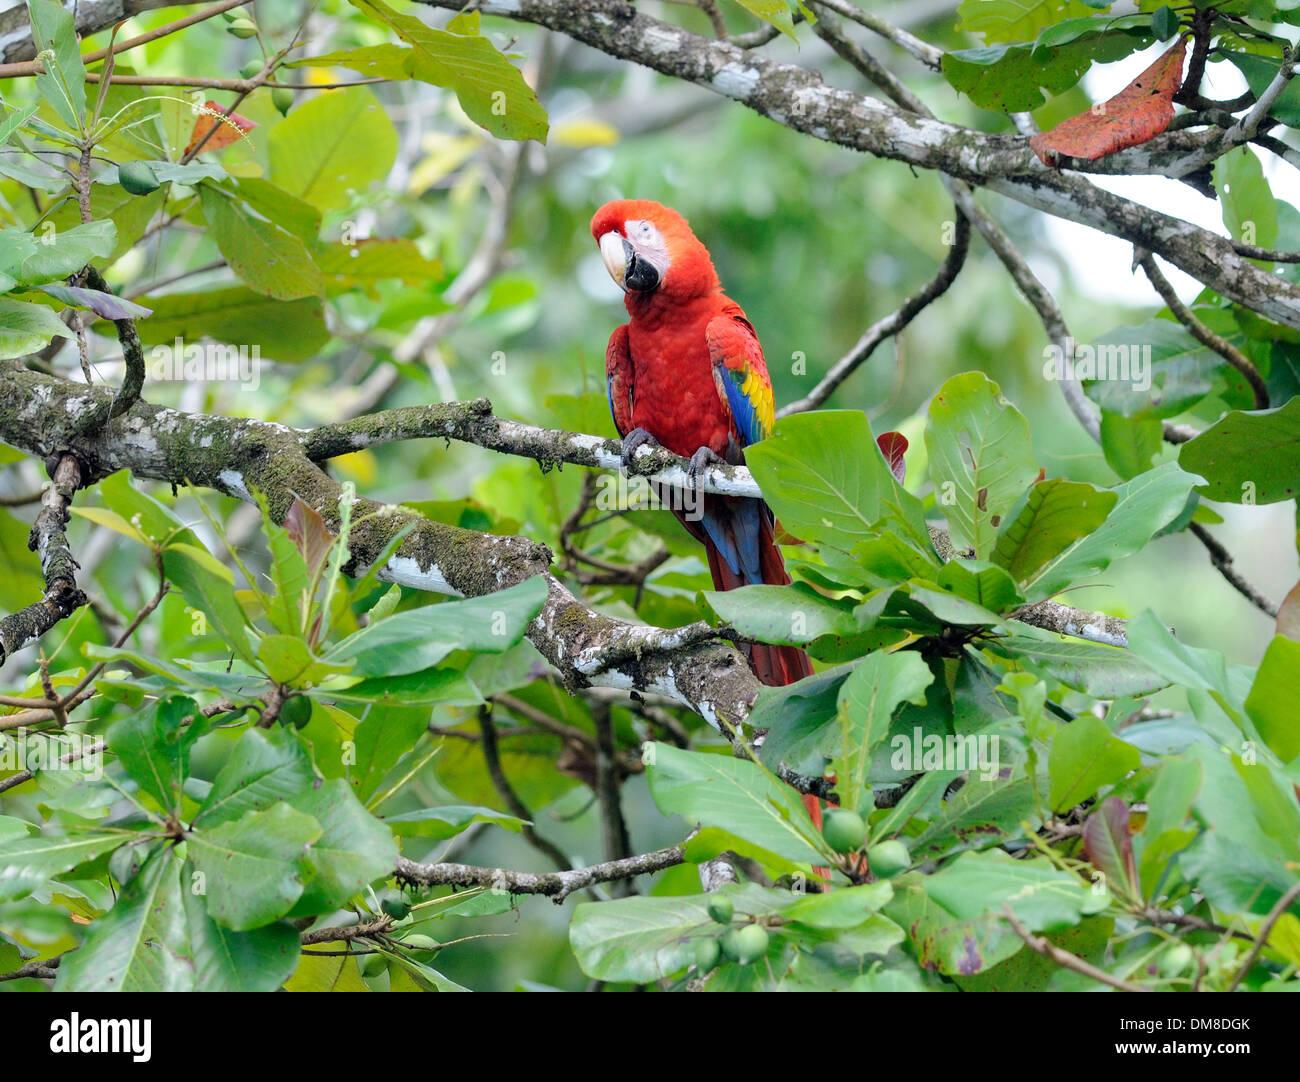 A Scarlet Macaw (Ara macao) feeding on the fruit, almendra, of an almond tree (Terminalia catappa), almendro. Corcovado - Stock Image